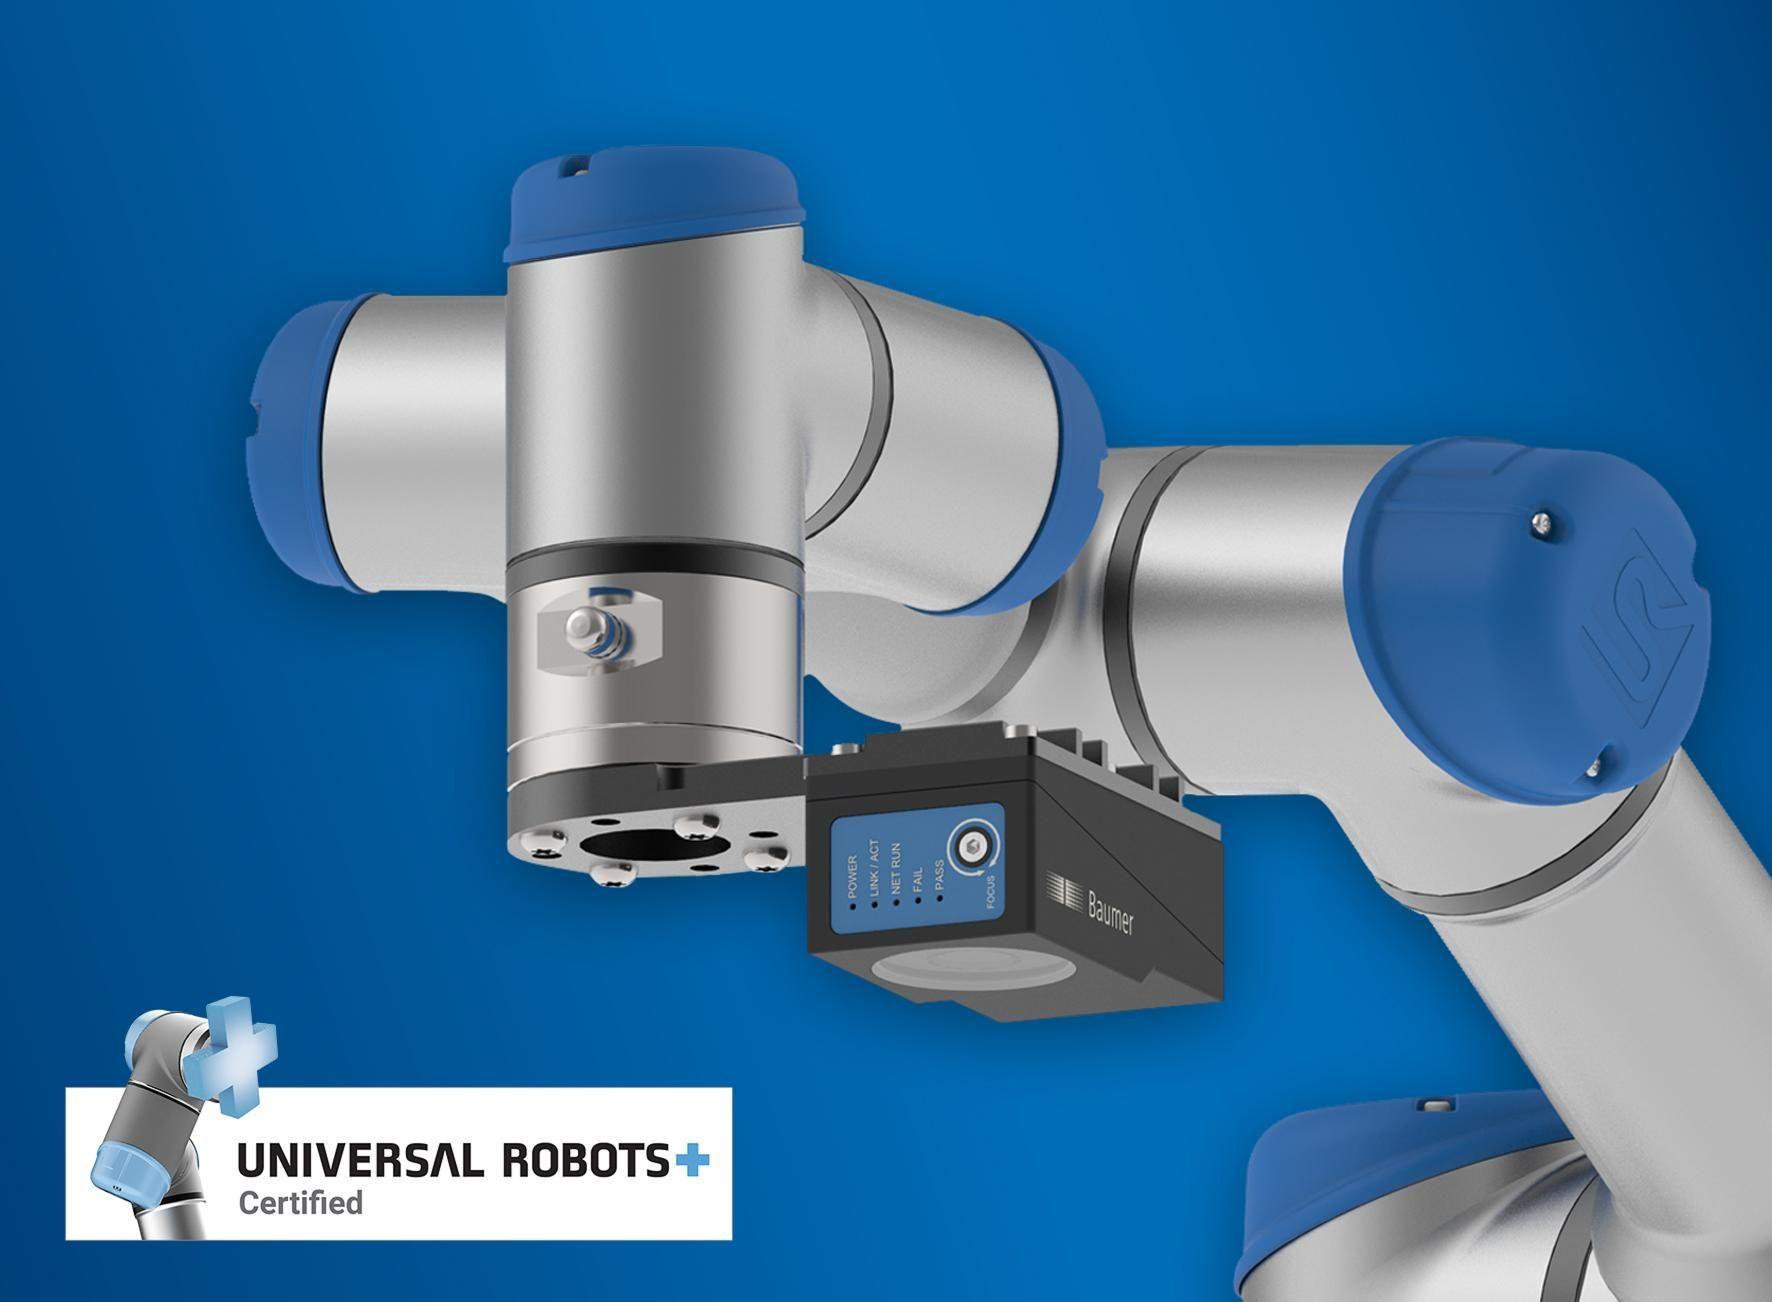 Easier than ever before: VeriSens vision sensors control Universal Robots